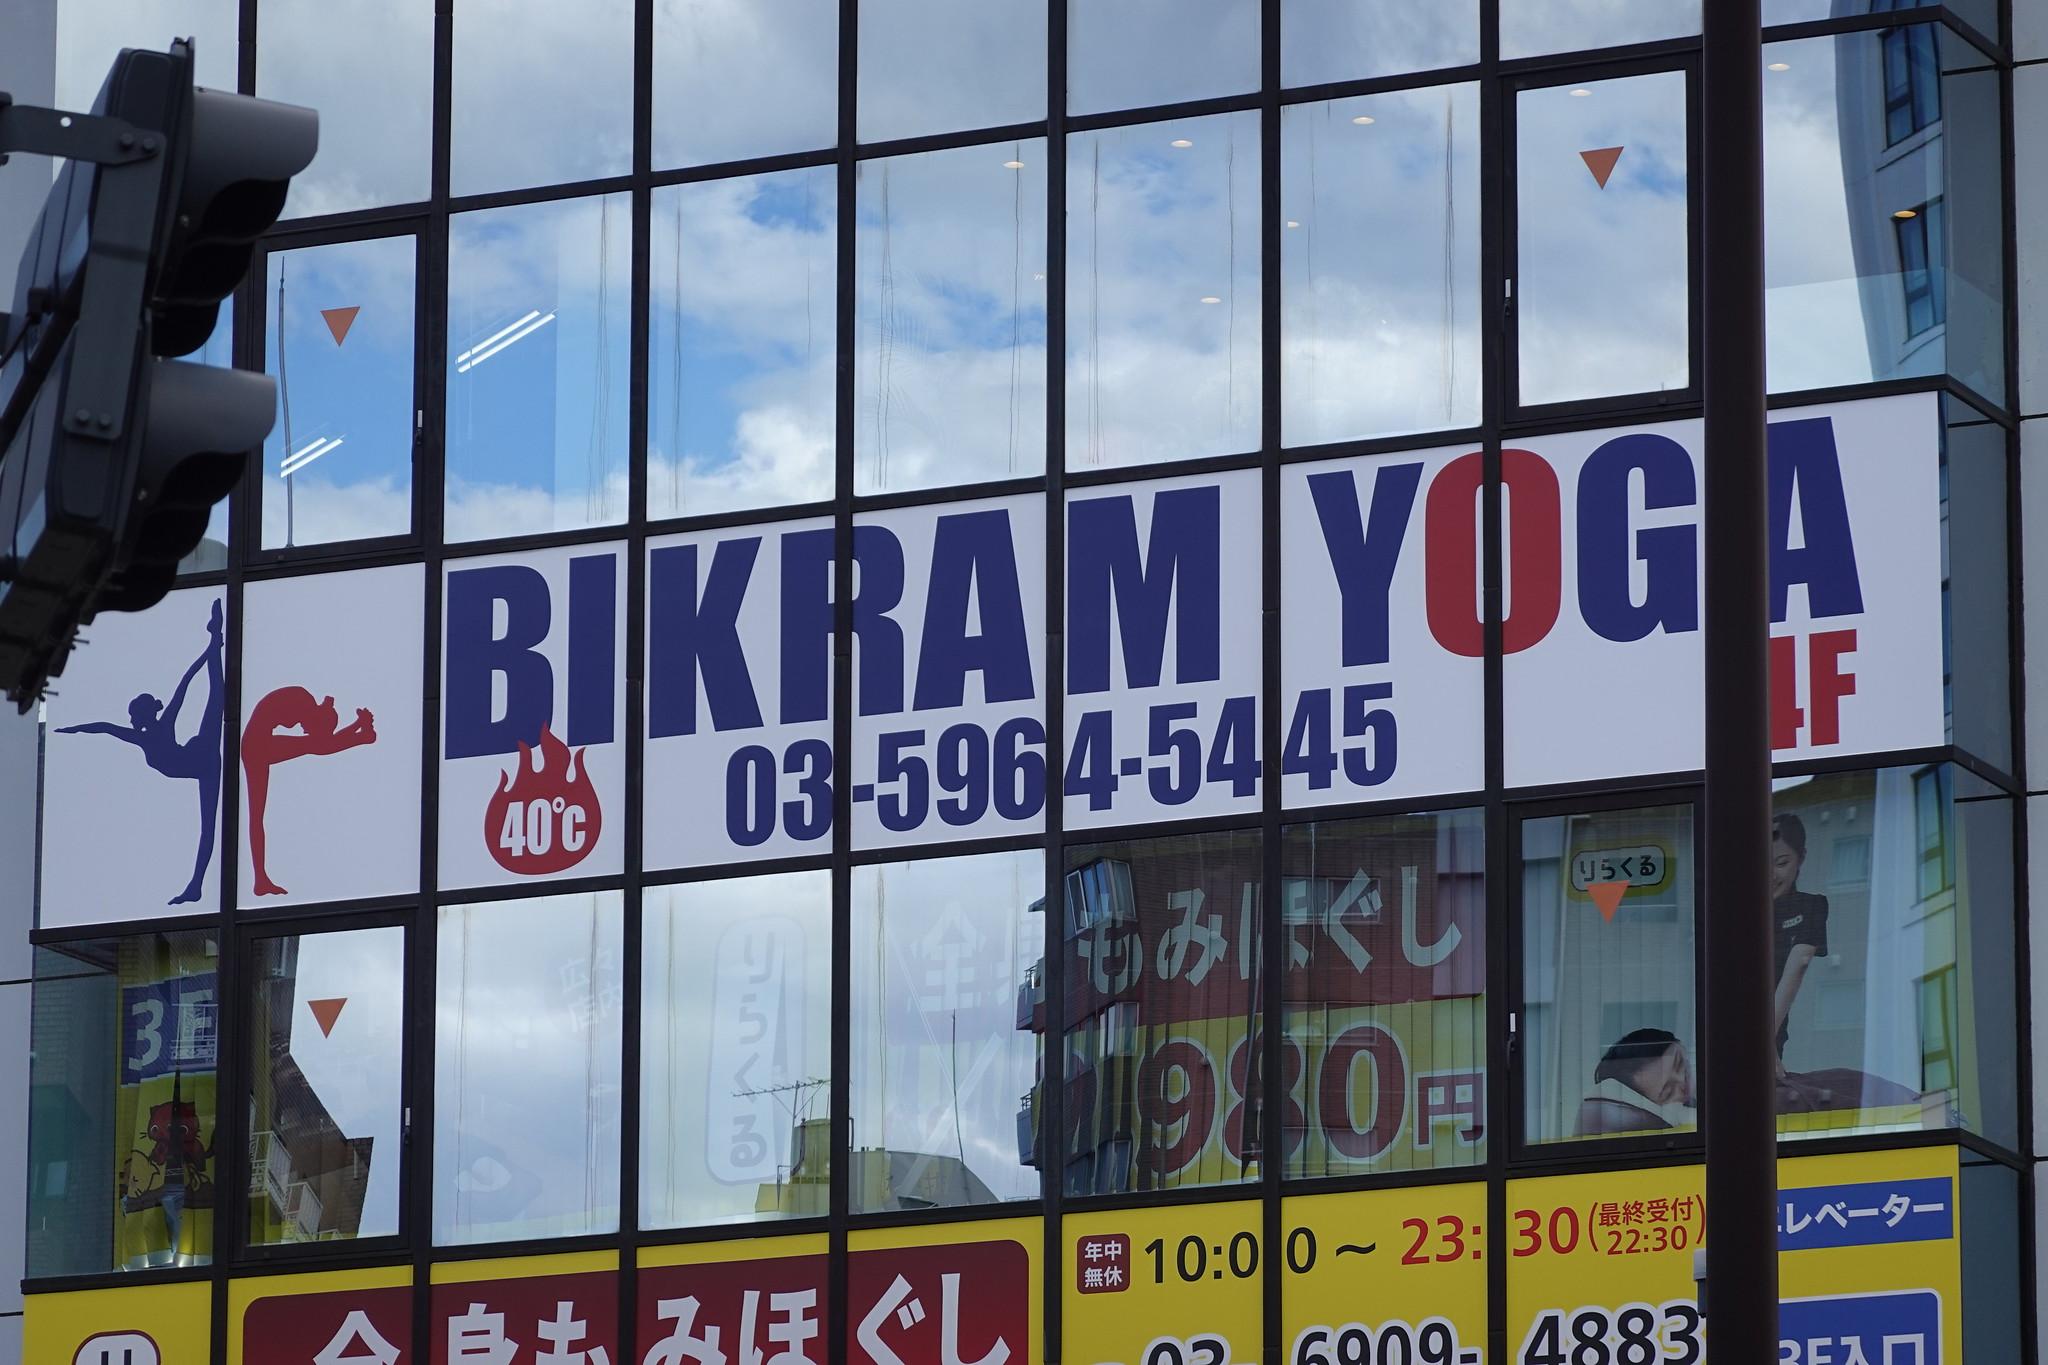 BIKRAM(要町)